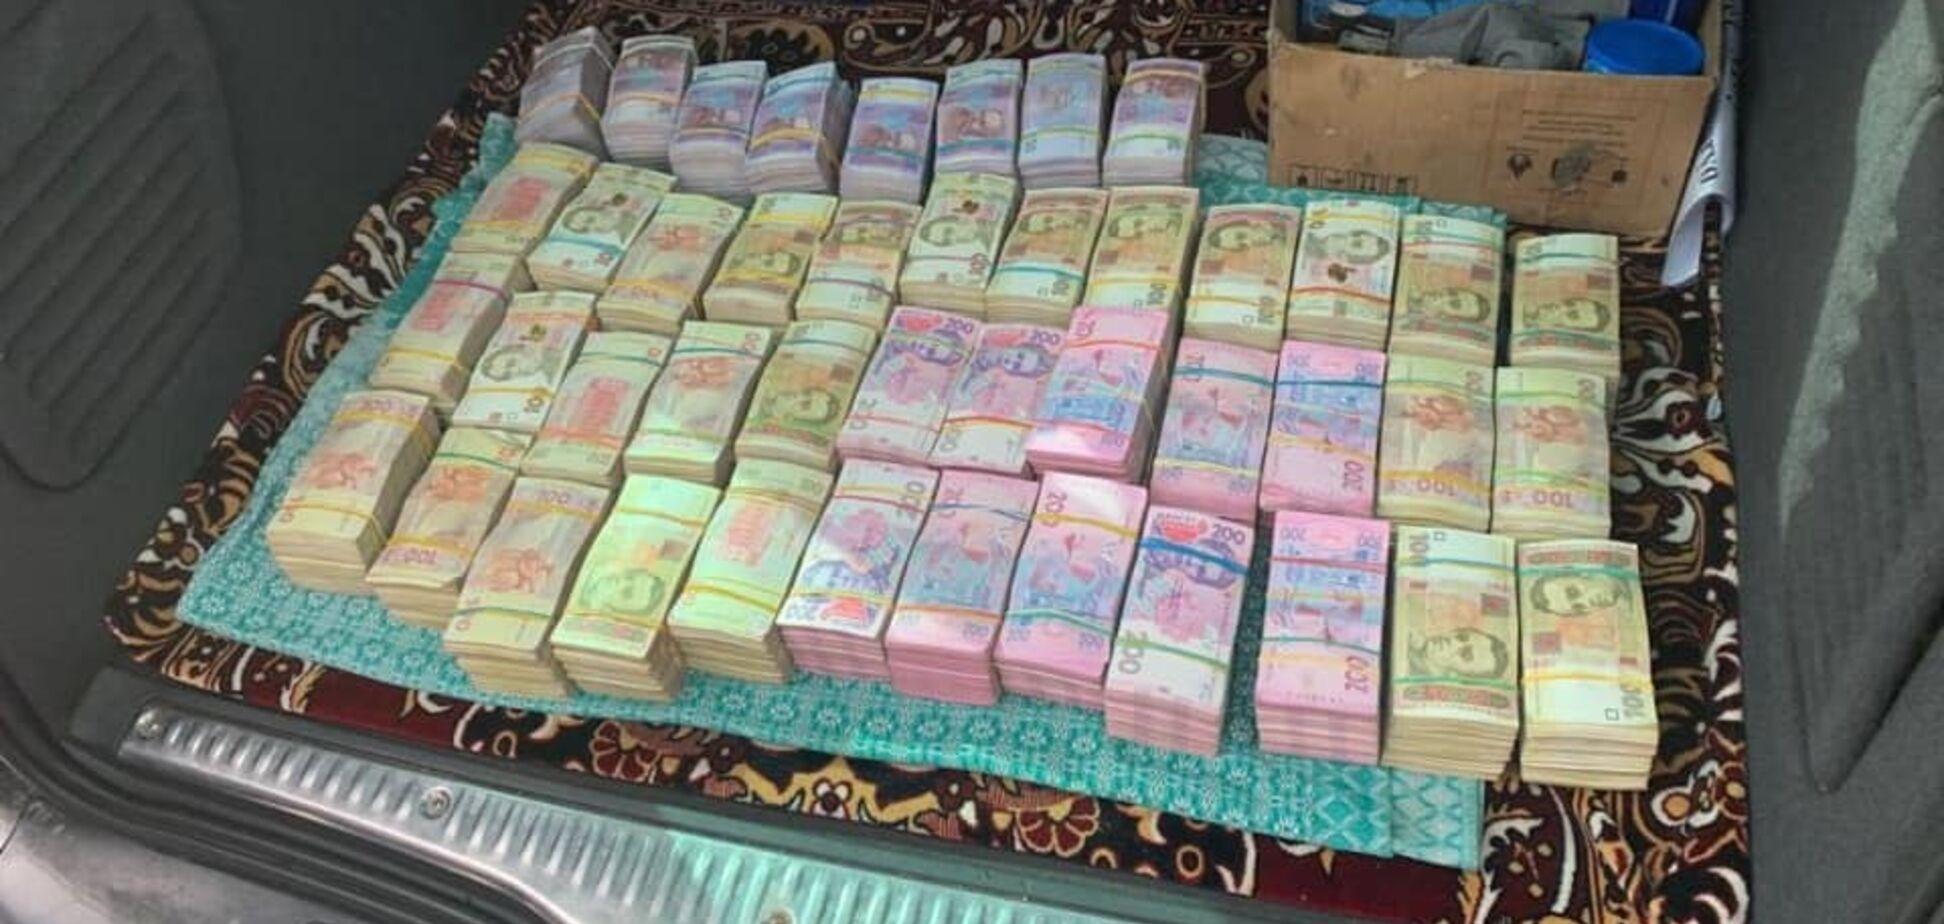 Подкуп избирателей: на Ривненщине задержали агитатора с 2,5 млн налички